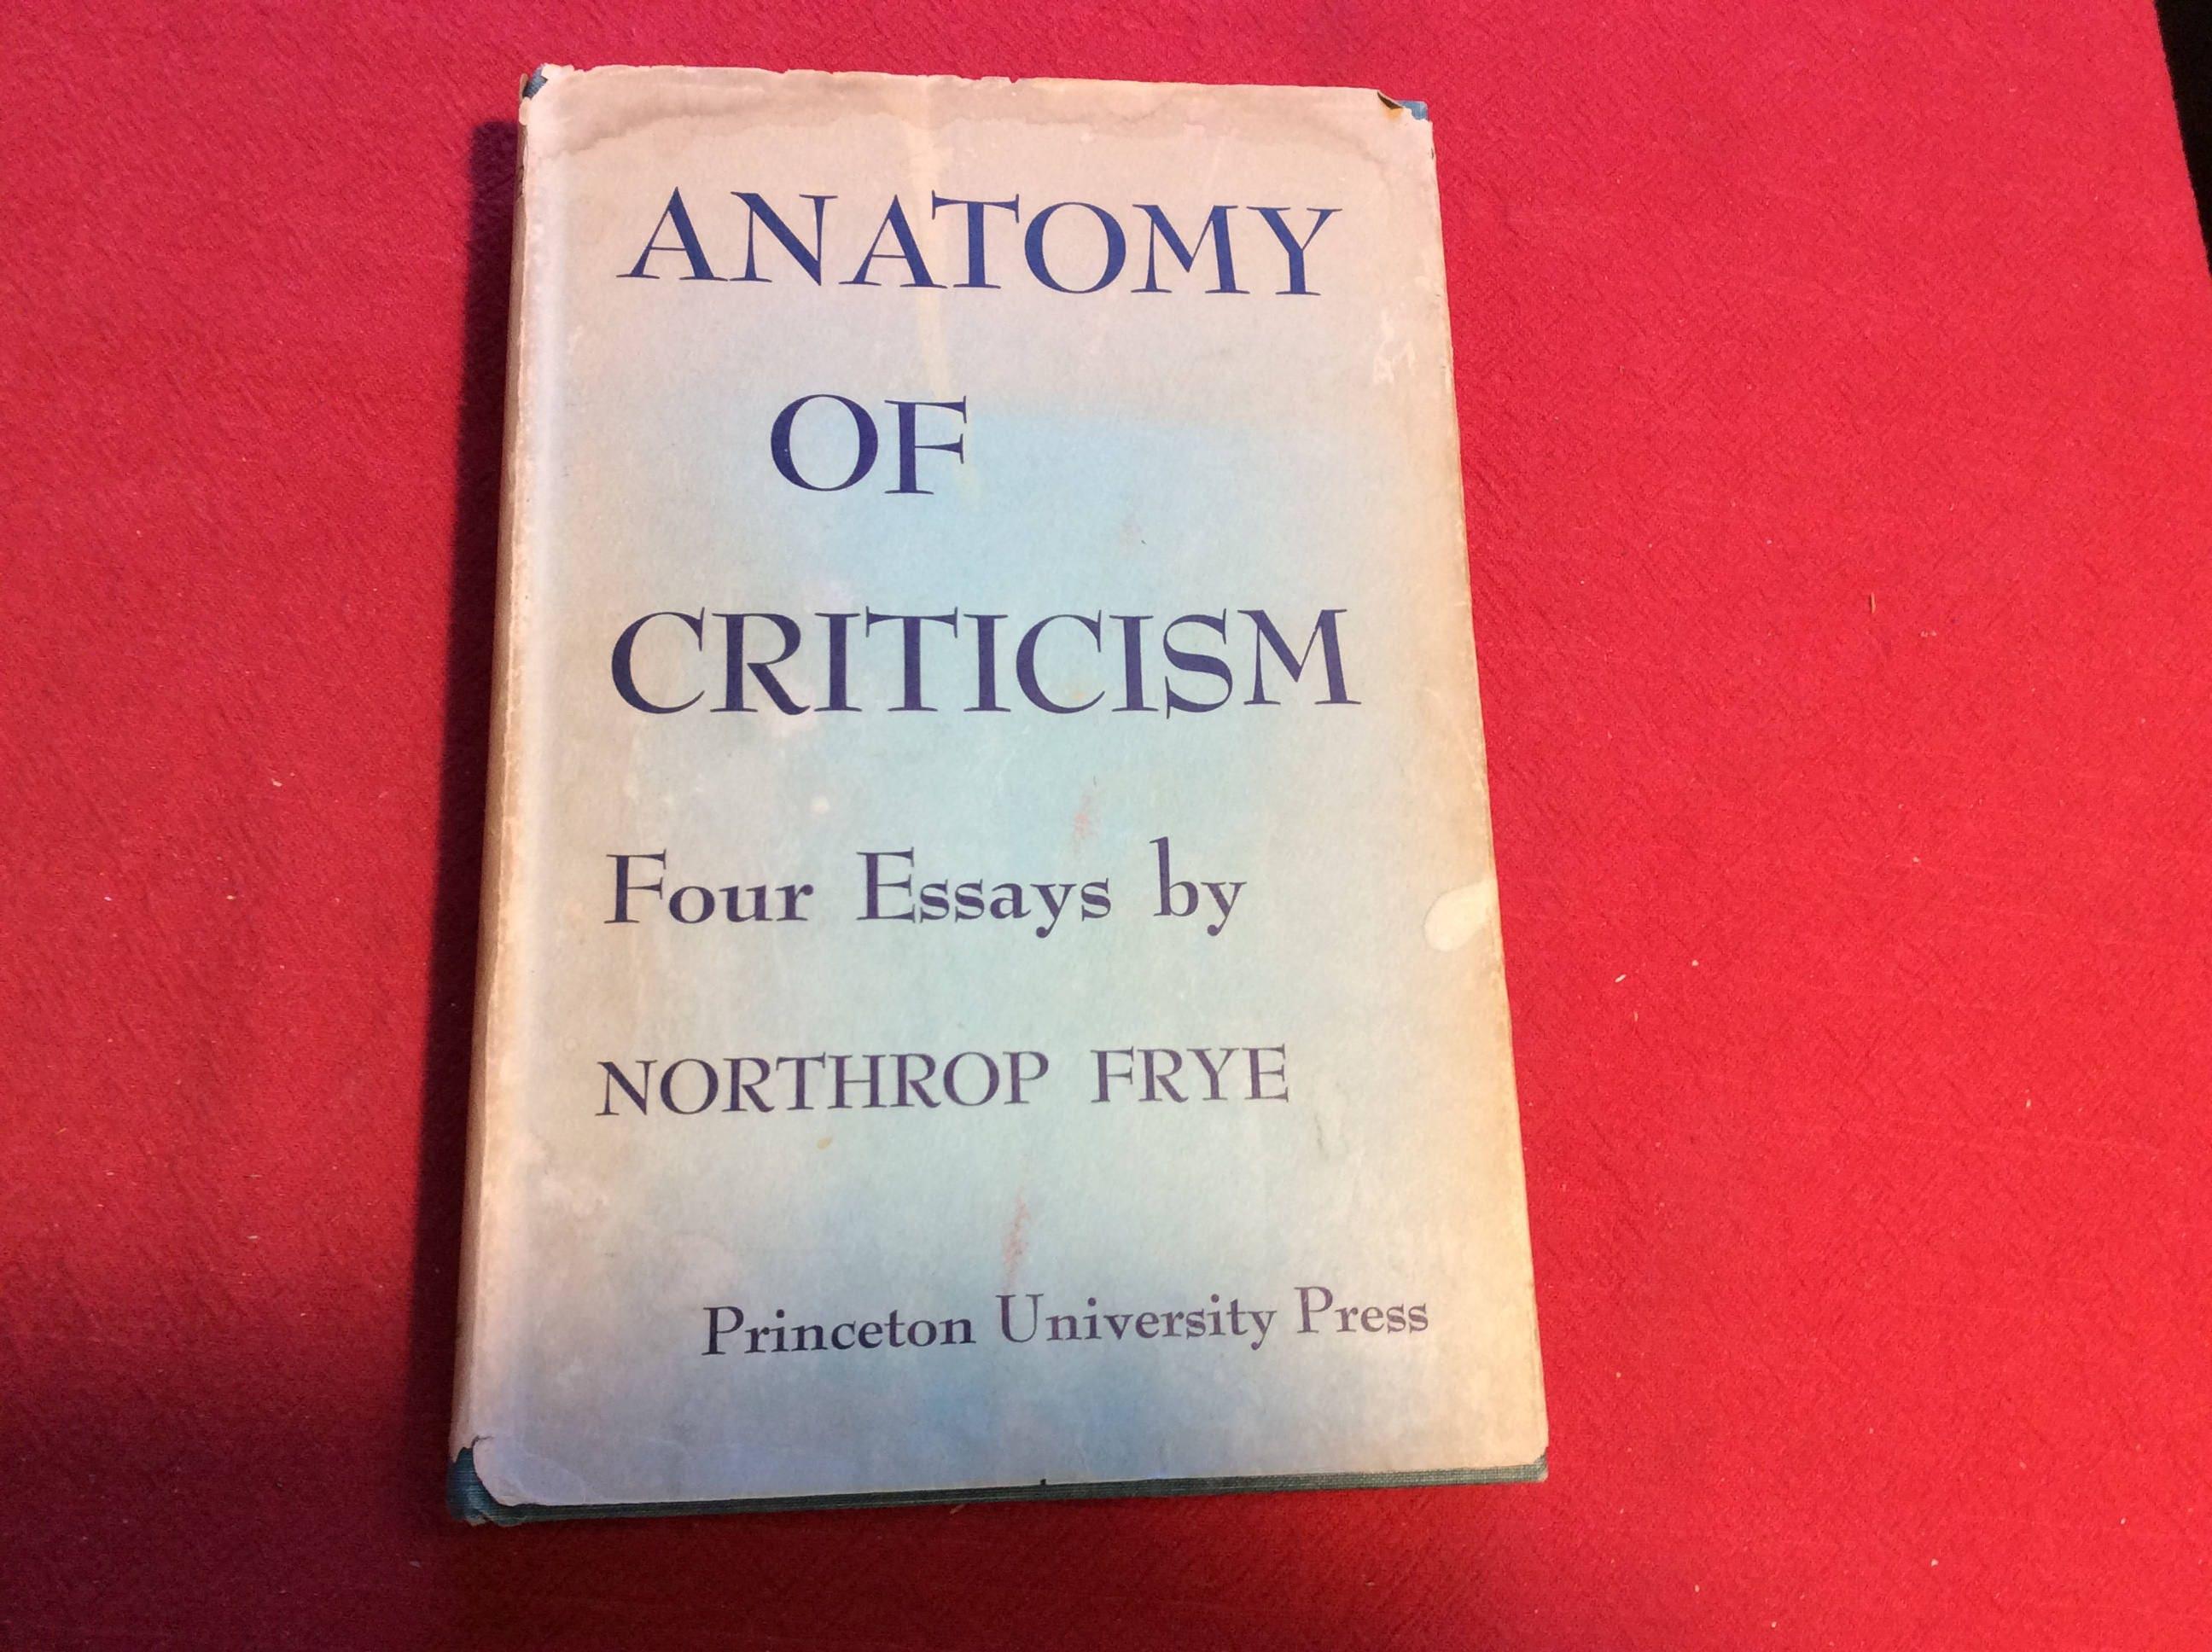 Anatomy of Criticism 1957 Edition